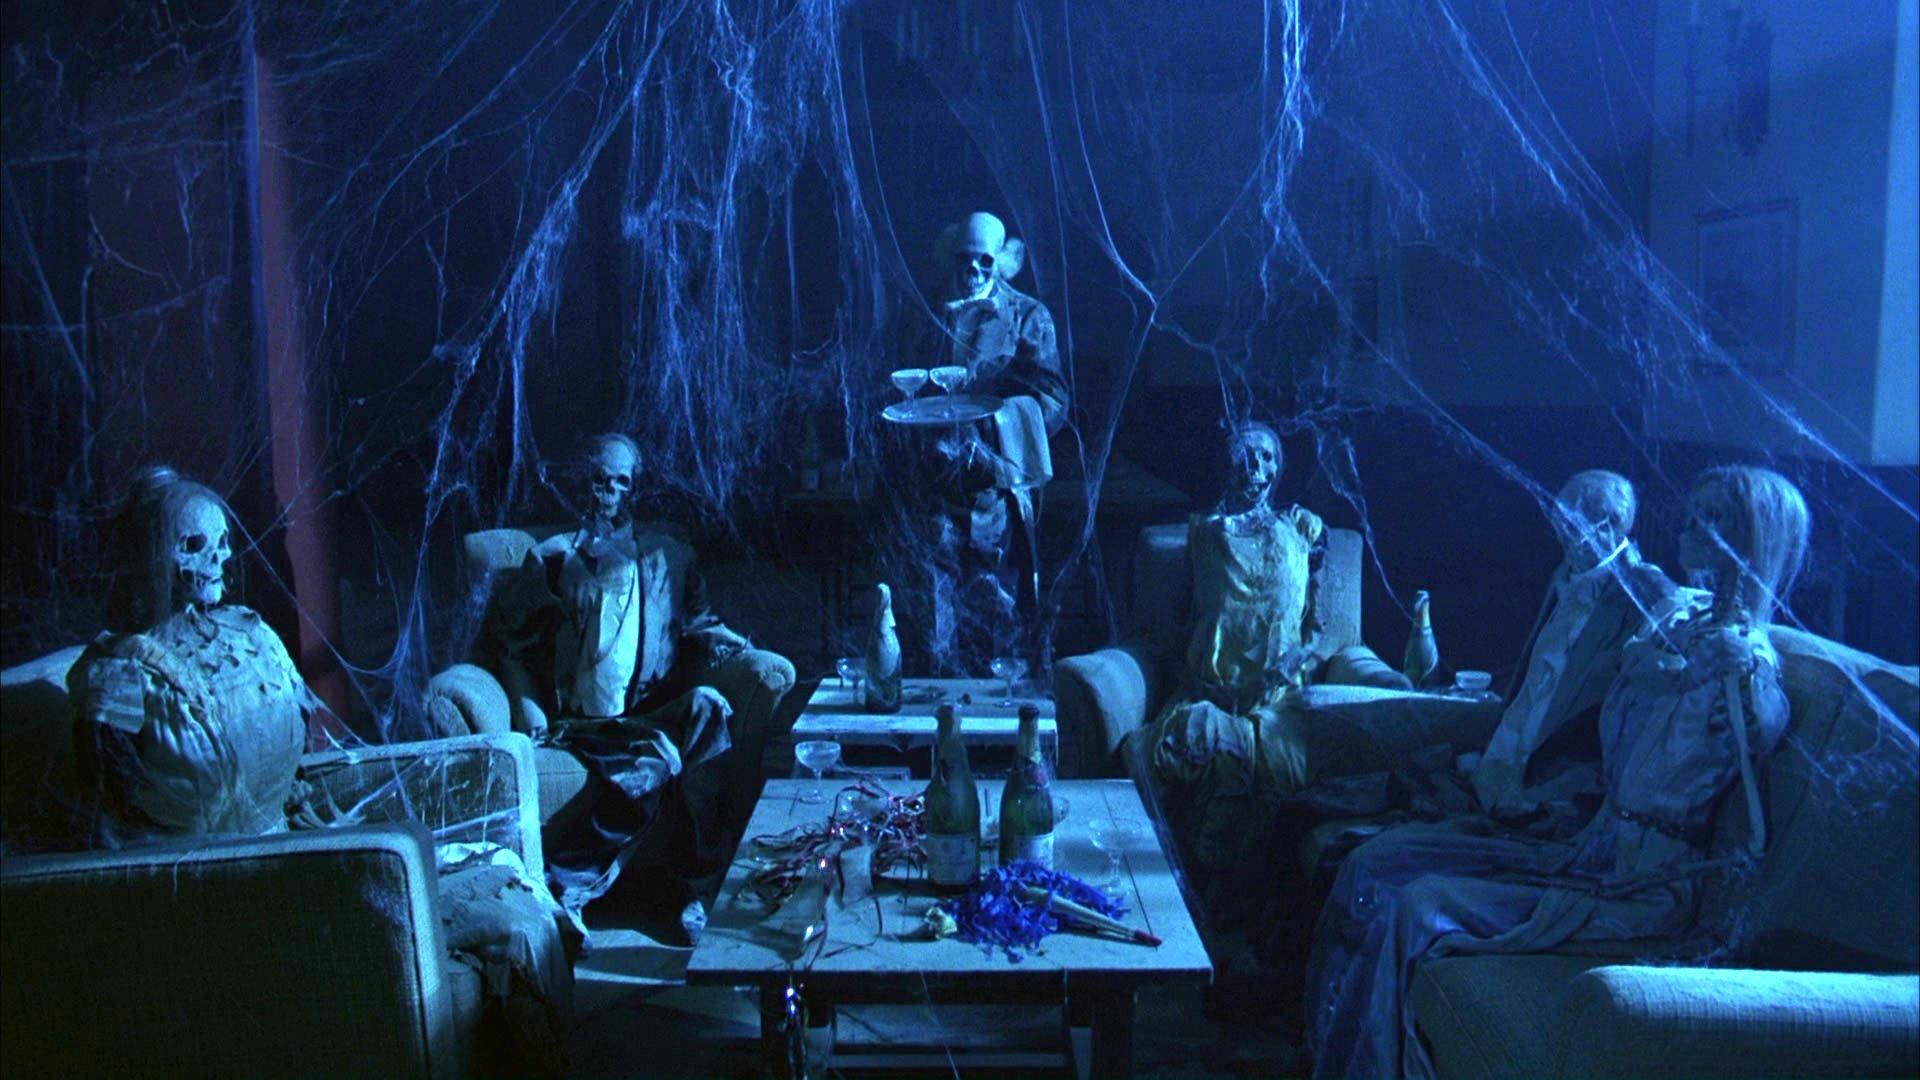 THE SHINING horror thriller dark movie film classic skeleton graveyard 1920x1080